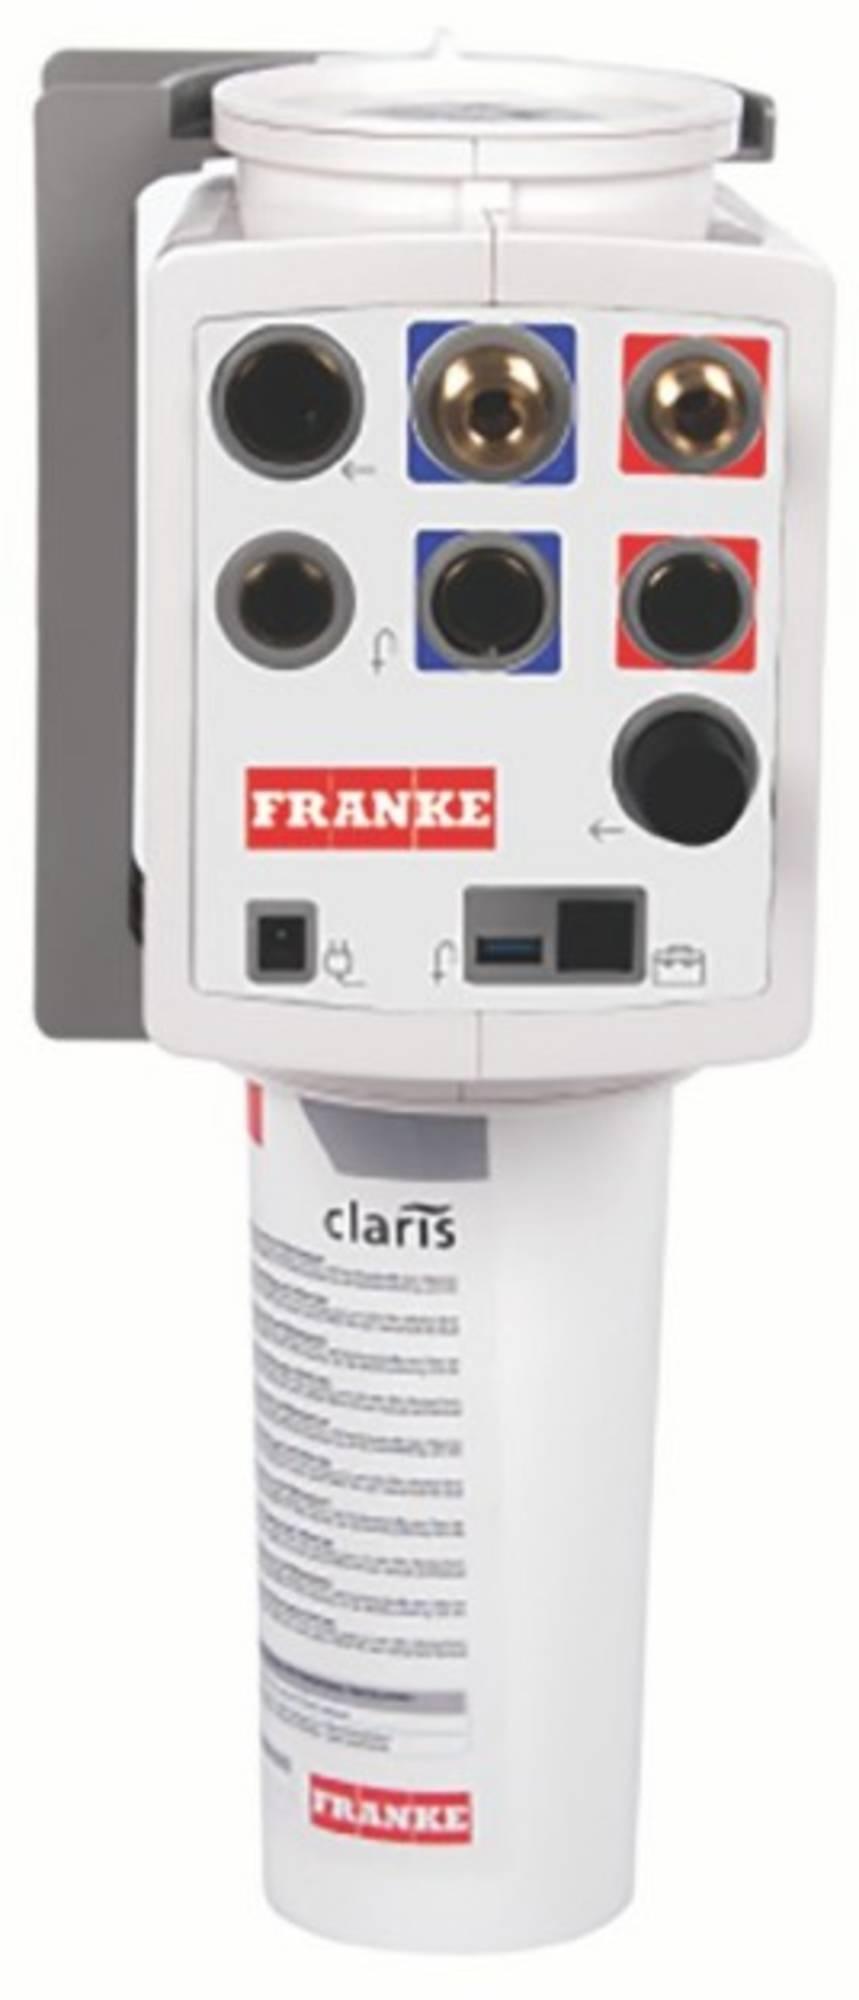 Franke M-box tbv 3-in-1 kraan incl filter